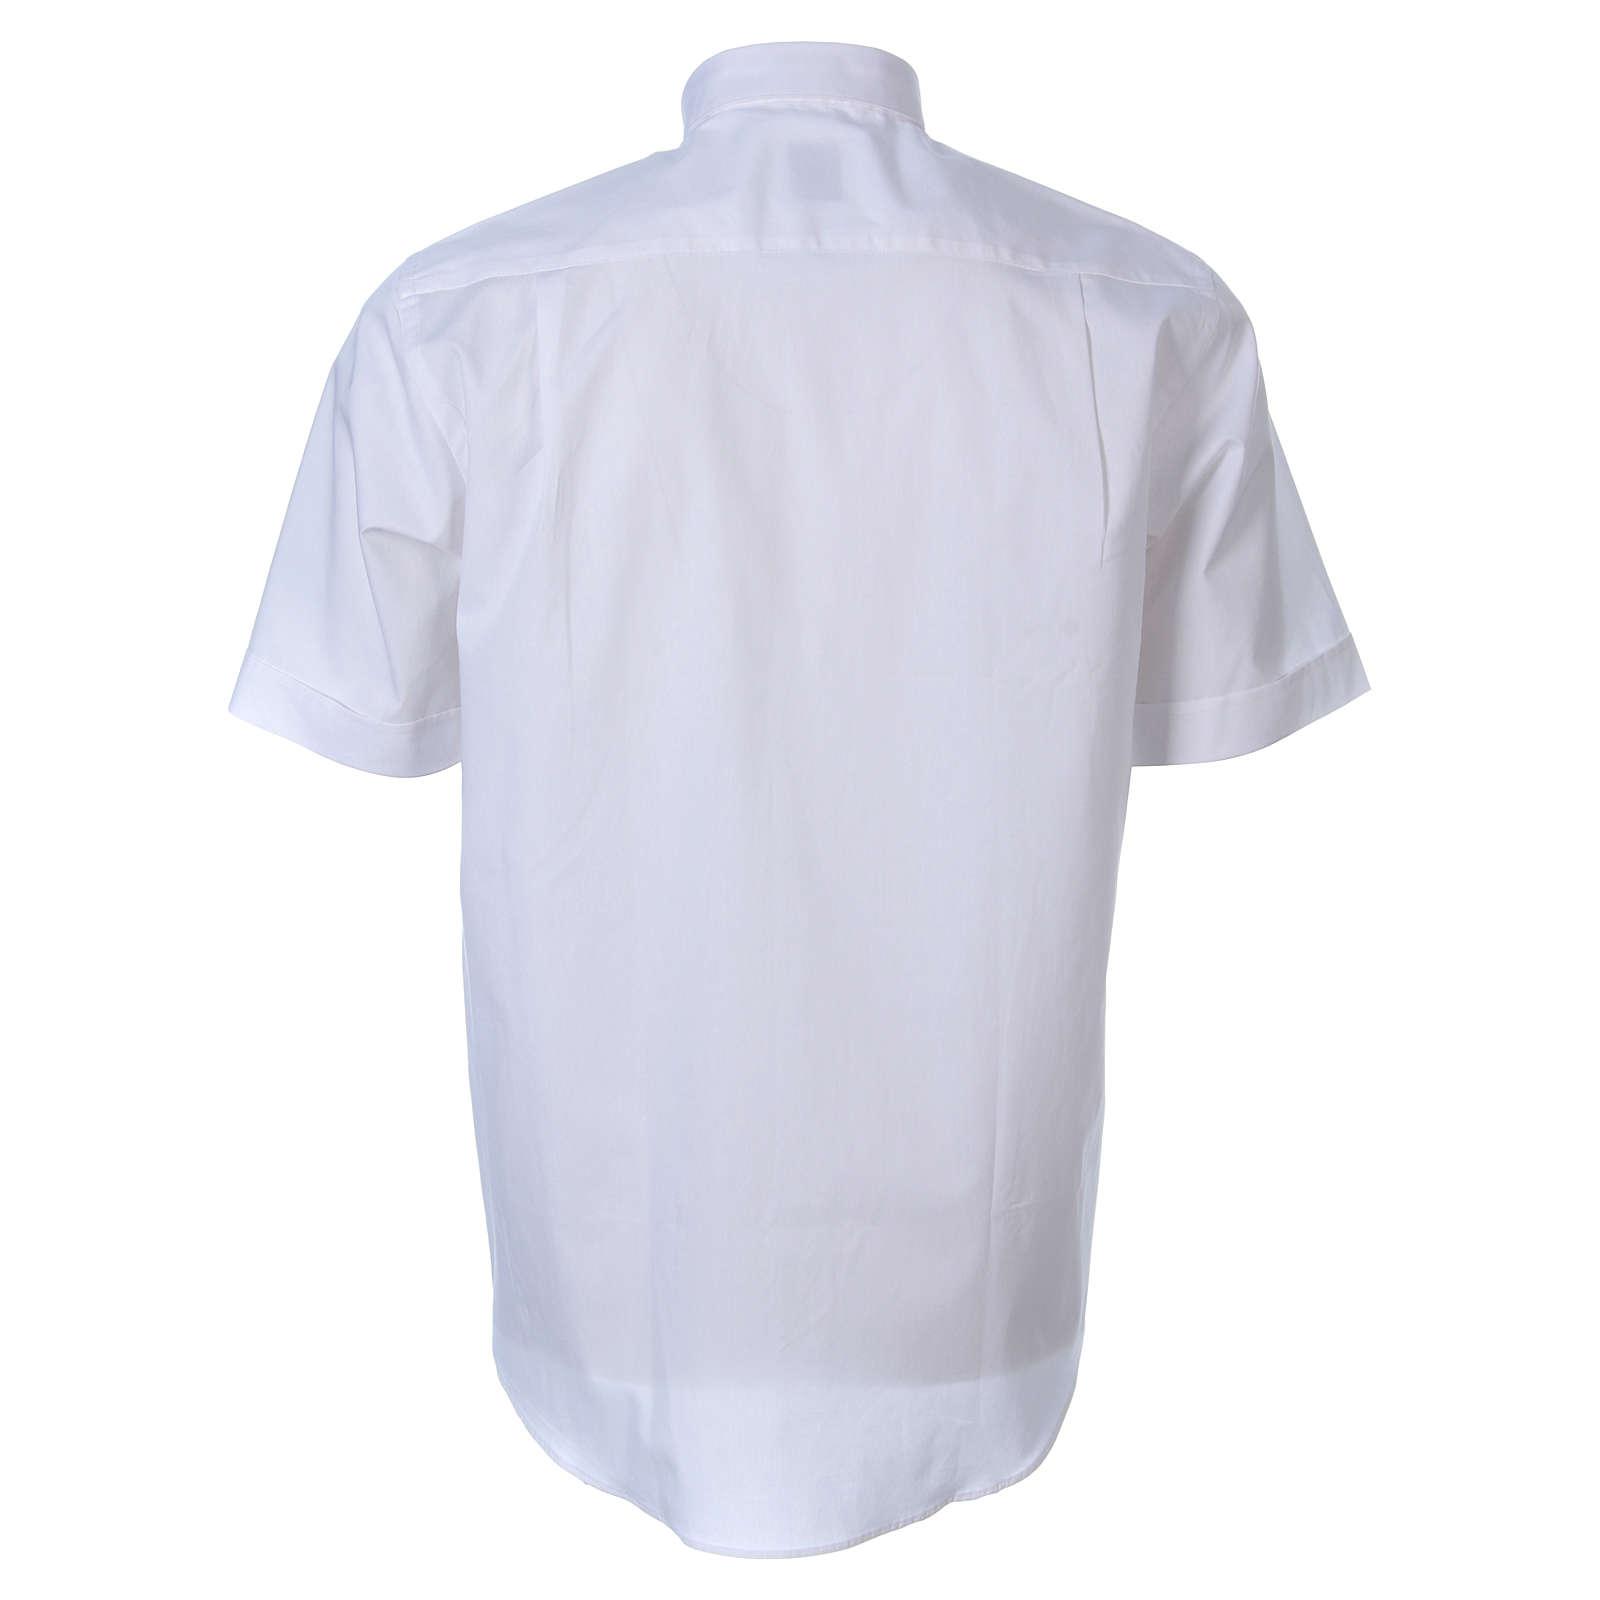 STOCK Camicia clergy manica corta popeline bianca 4